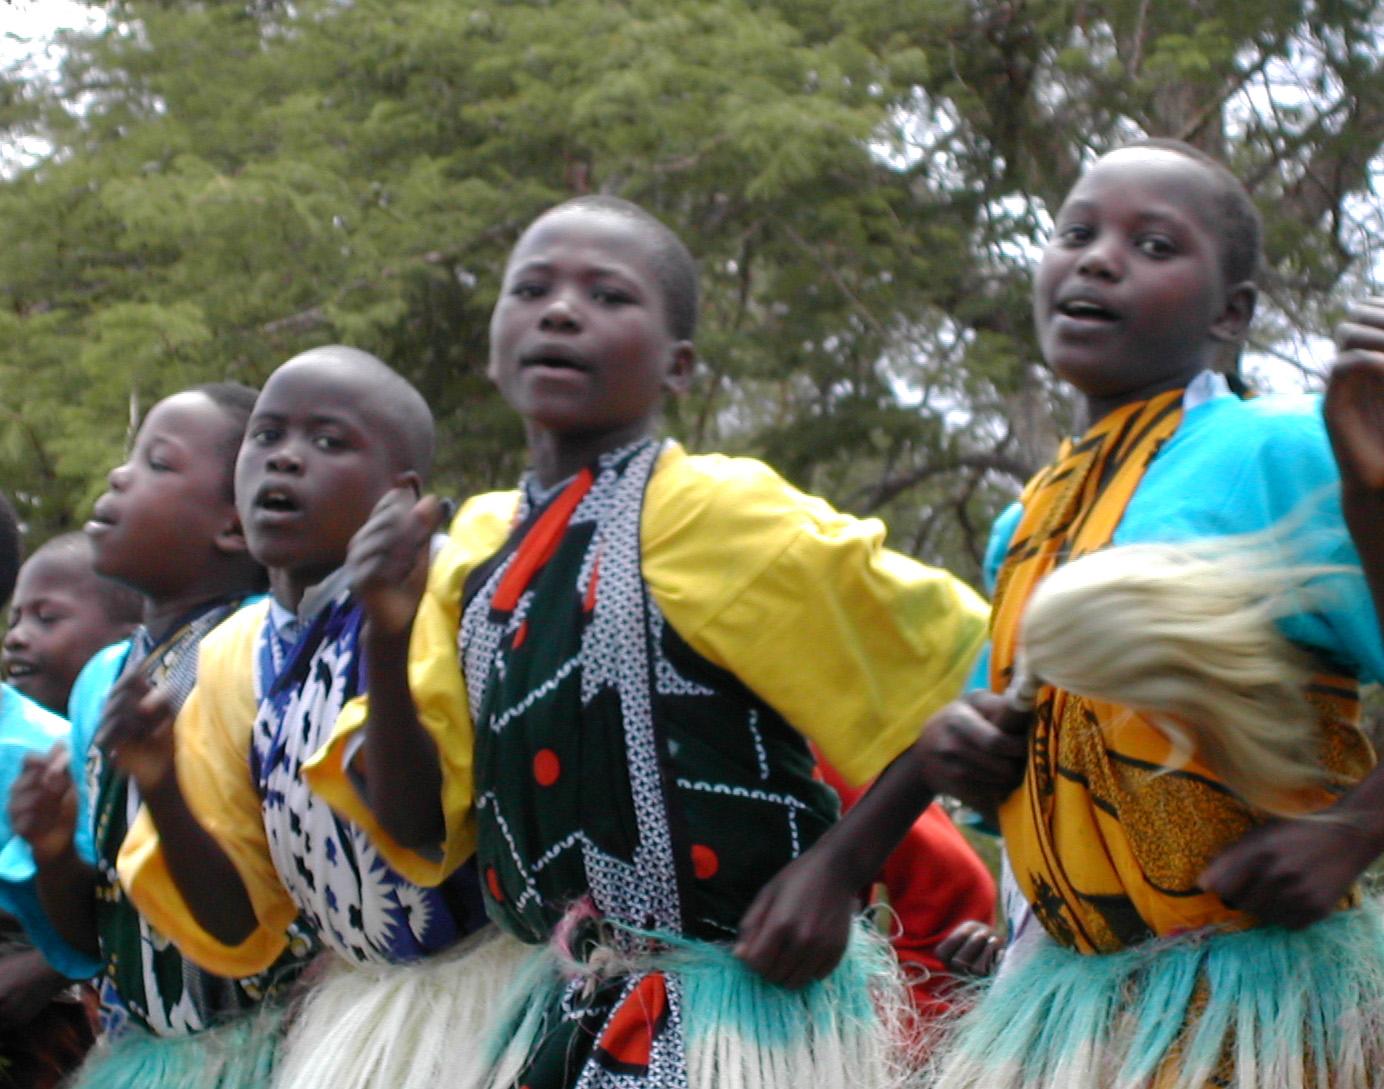 Kenyan People And Culture File:Kenyan dancers.jp...